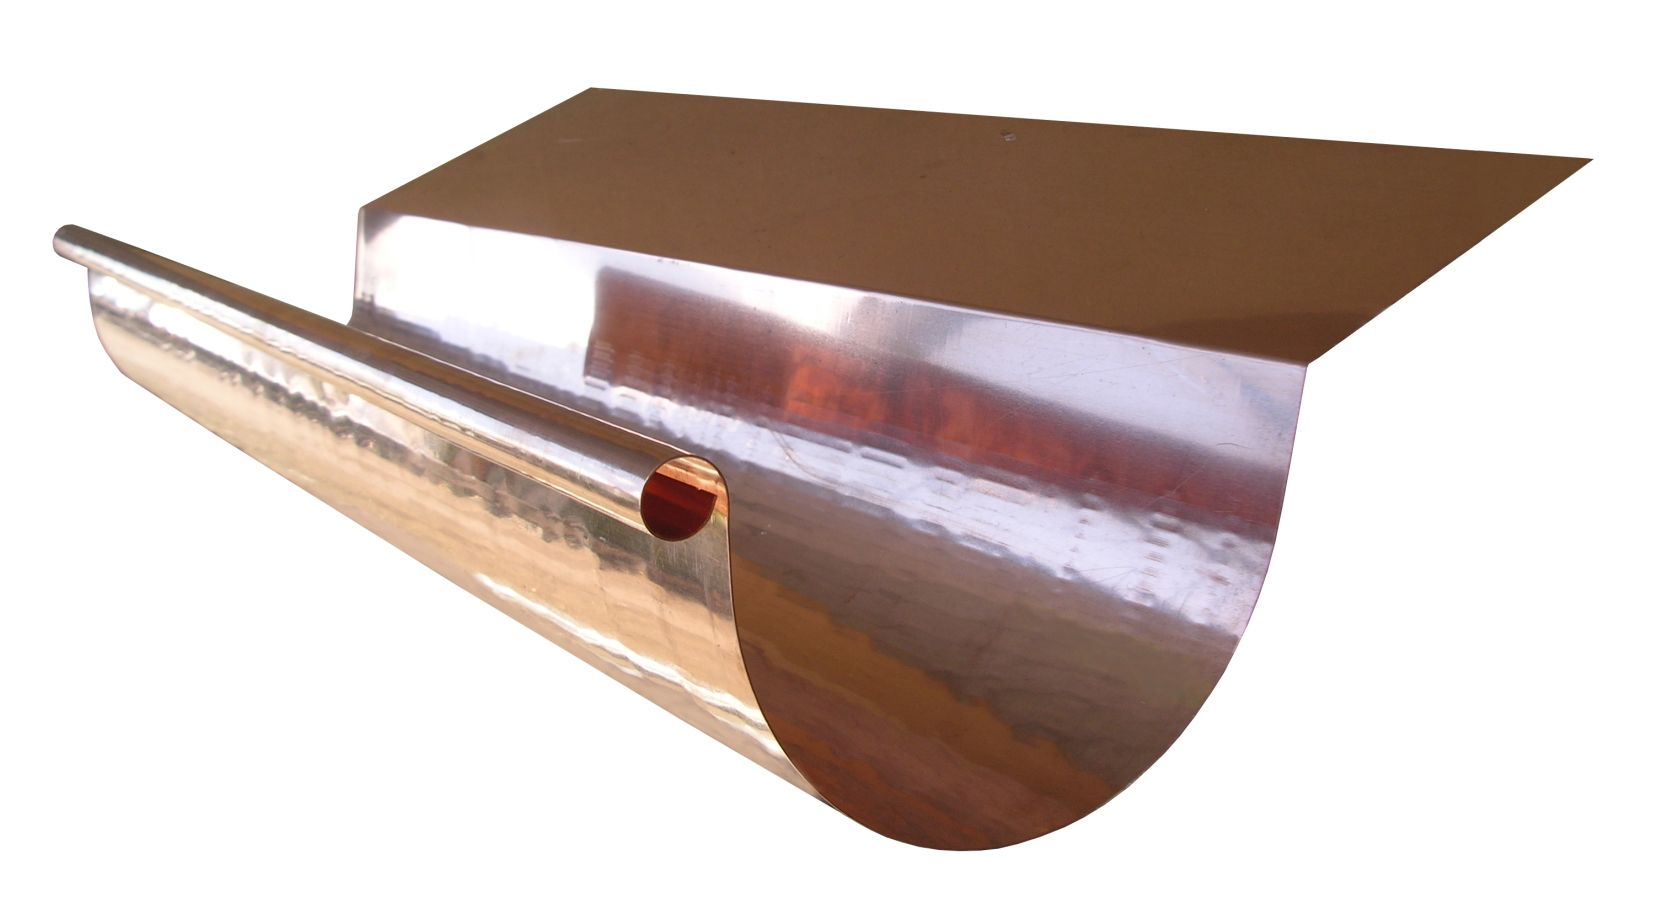 Copper Half Round Highback Gutter Gutter Supply Drip Edge Metal Roof Construction Gutters